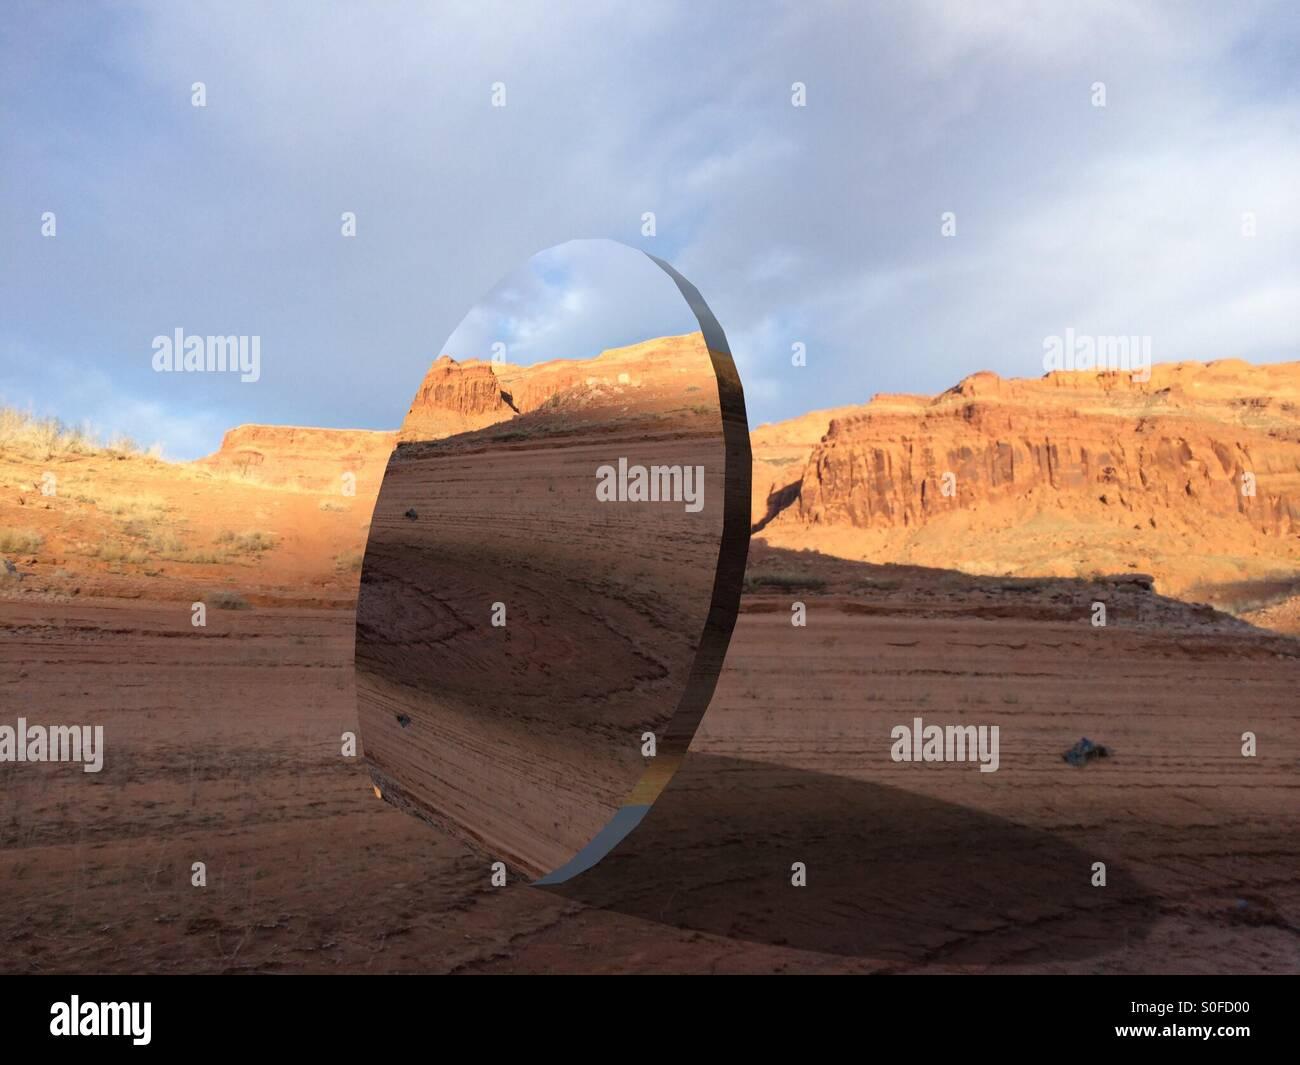 Large round mirror in desert - Stock Image